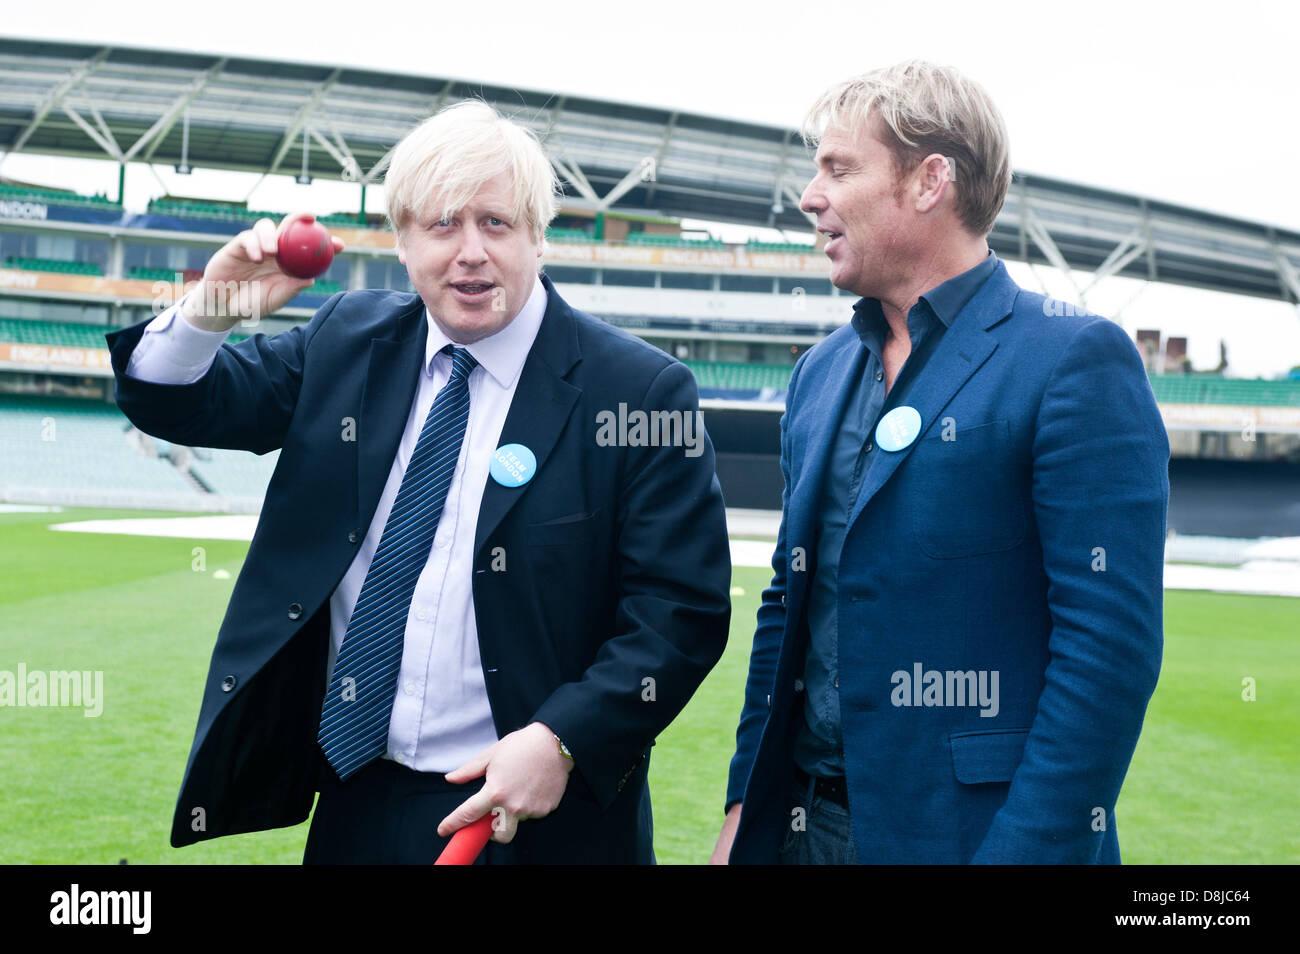 London, UK. 30th May 2013. Mayor of London, Boris Johnson joins  international cricket legend Shane Warne at The - Stock Image